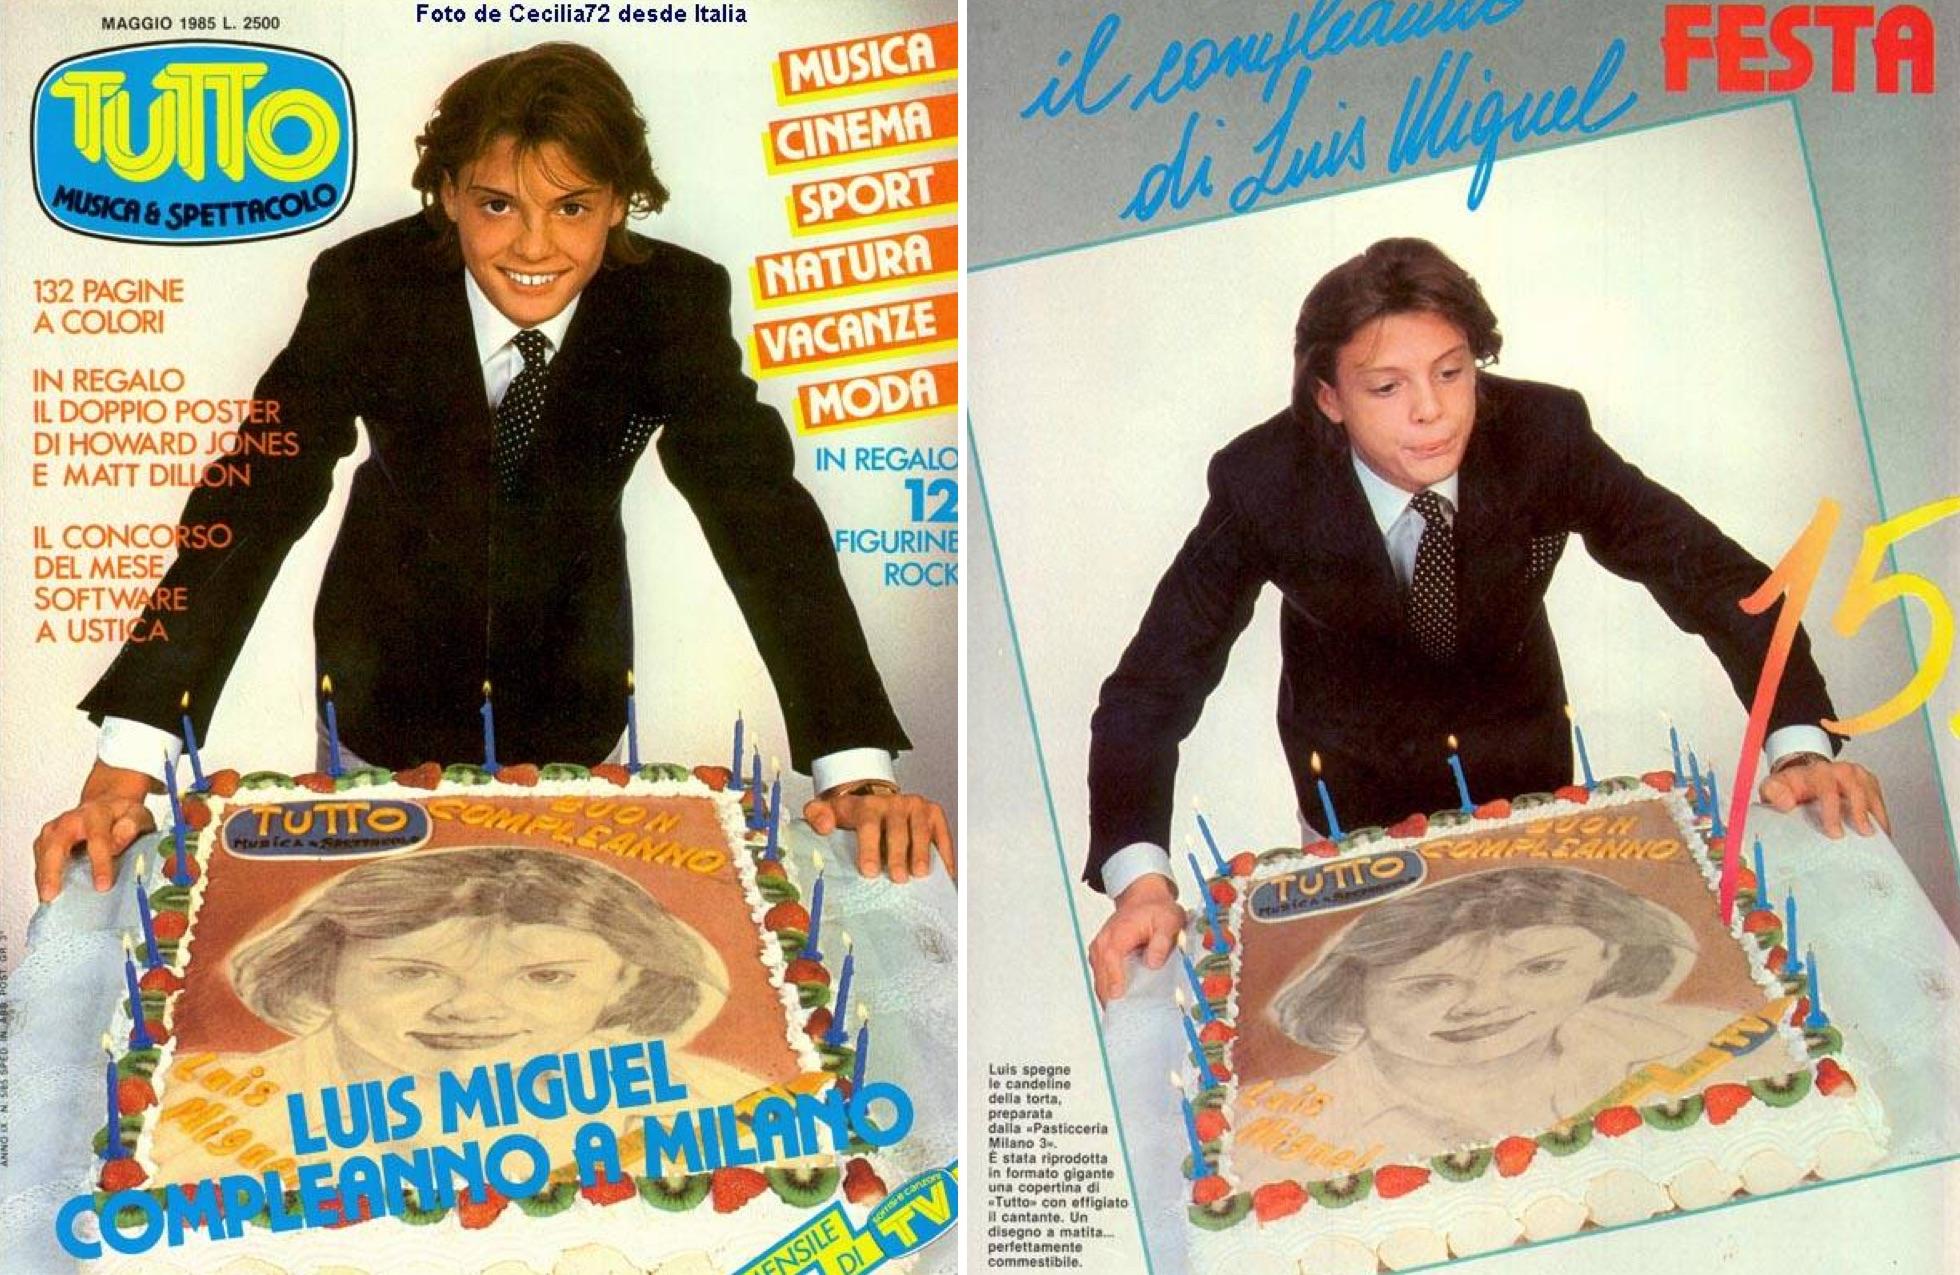 Luis Miguel celebra su cumpleaños número 15. (Revista Tutto Musica & Spettacolo / LuisMiguelSite.com)